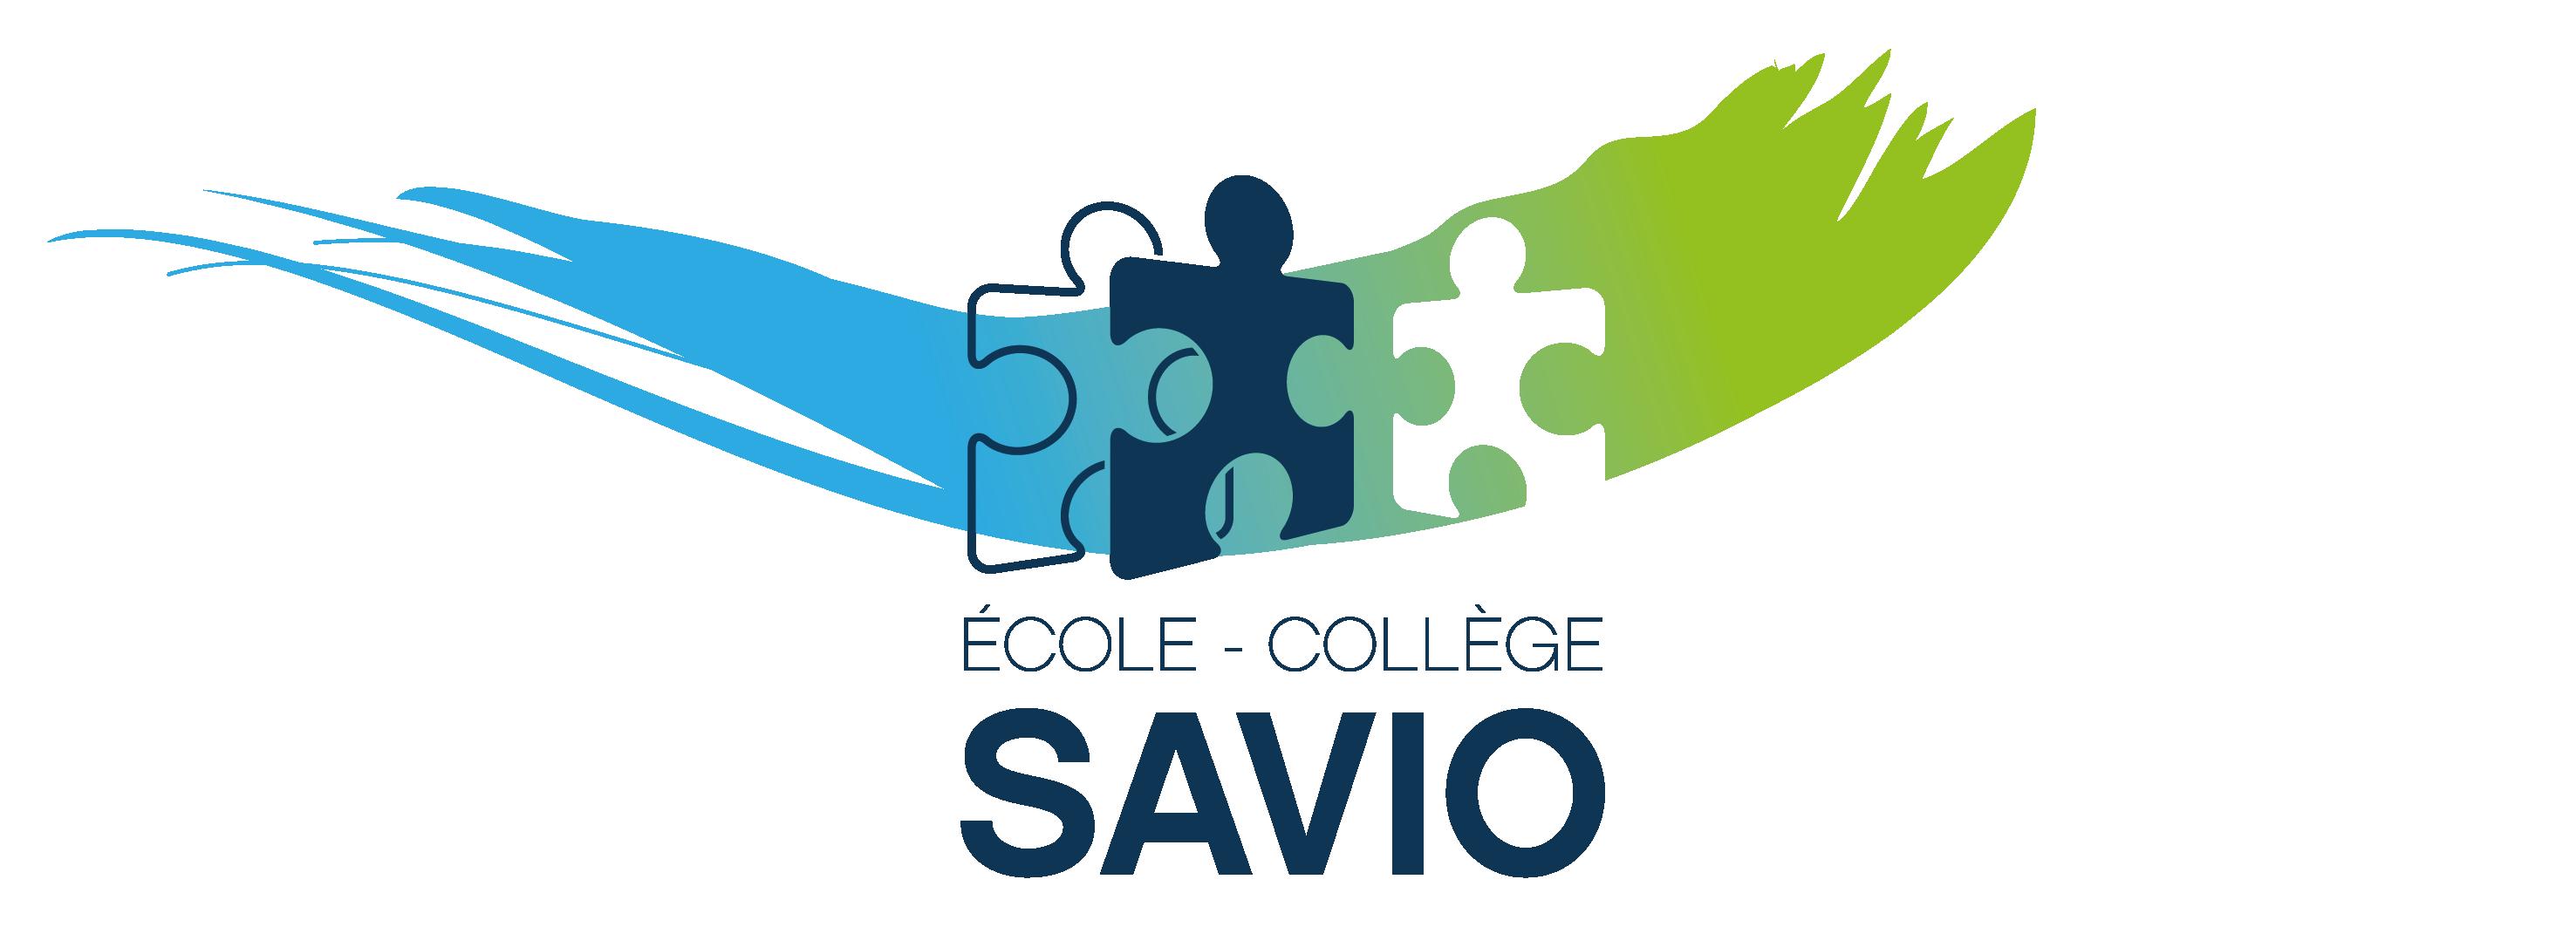 ECOLE COLLEGE SAVIO LOGO 2017